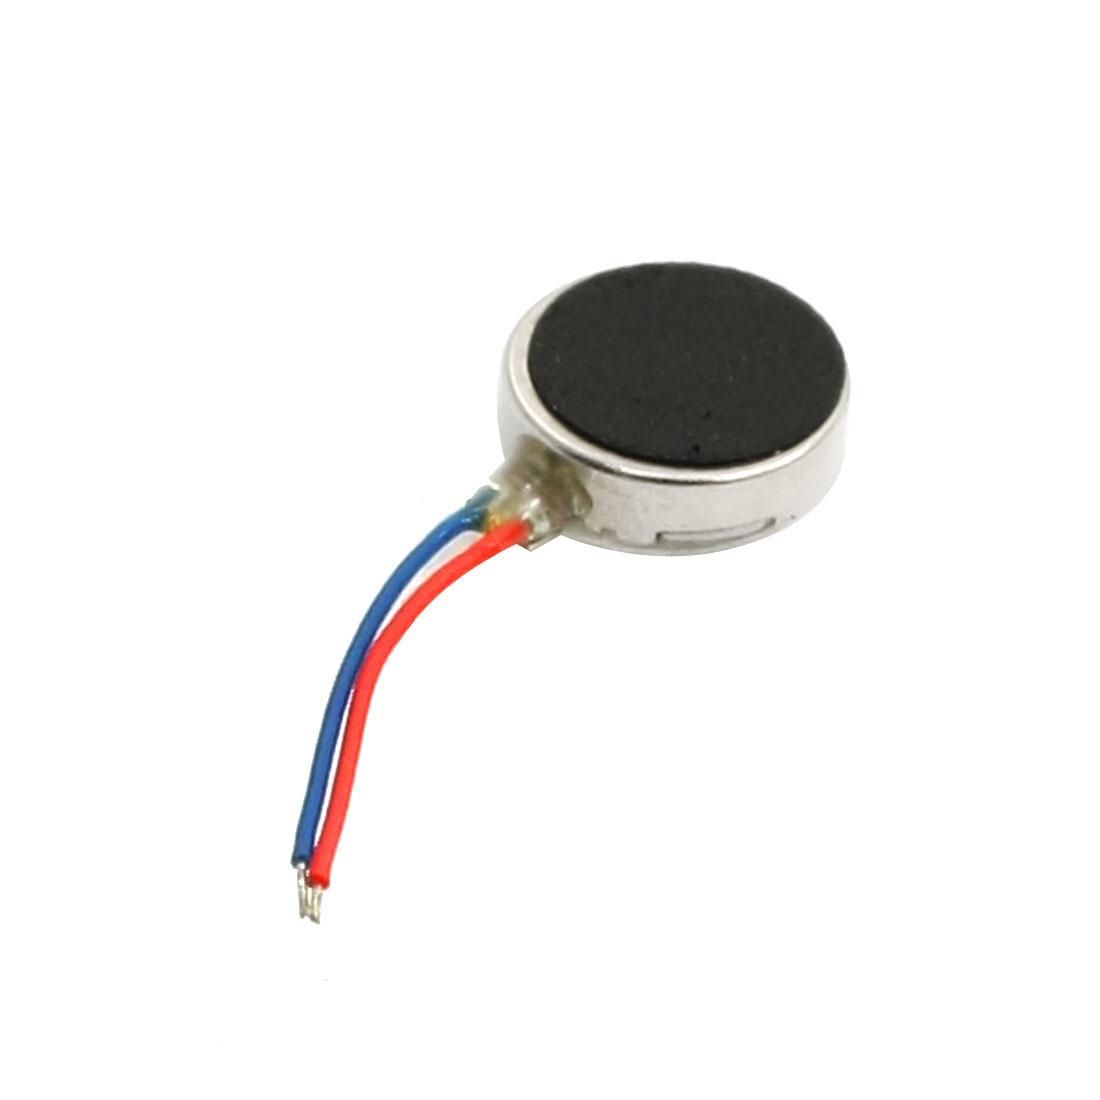 10mm-x-3mm-Cellphone-Vibration-DC-Micro-Mini-Motor-3V-11000RPM